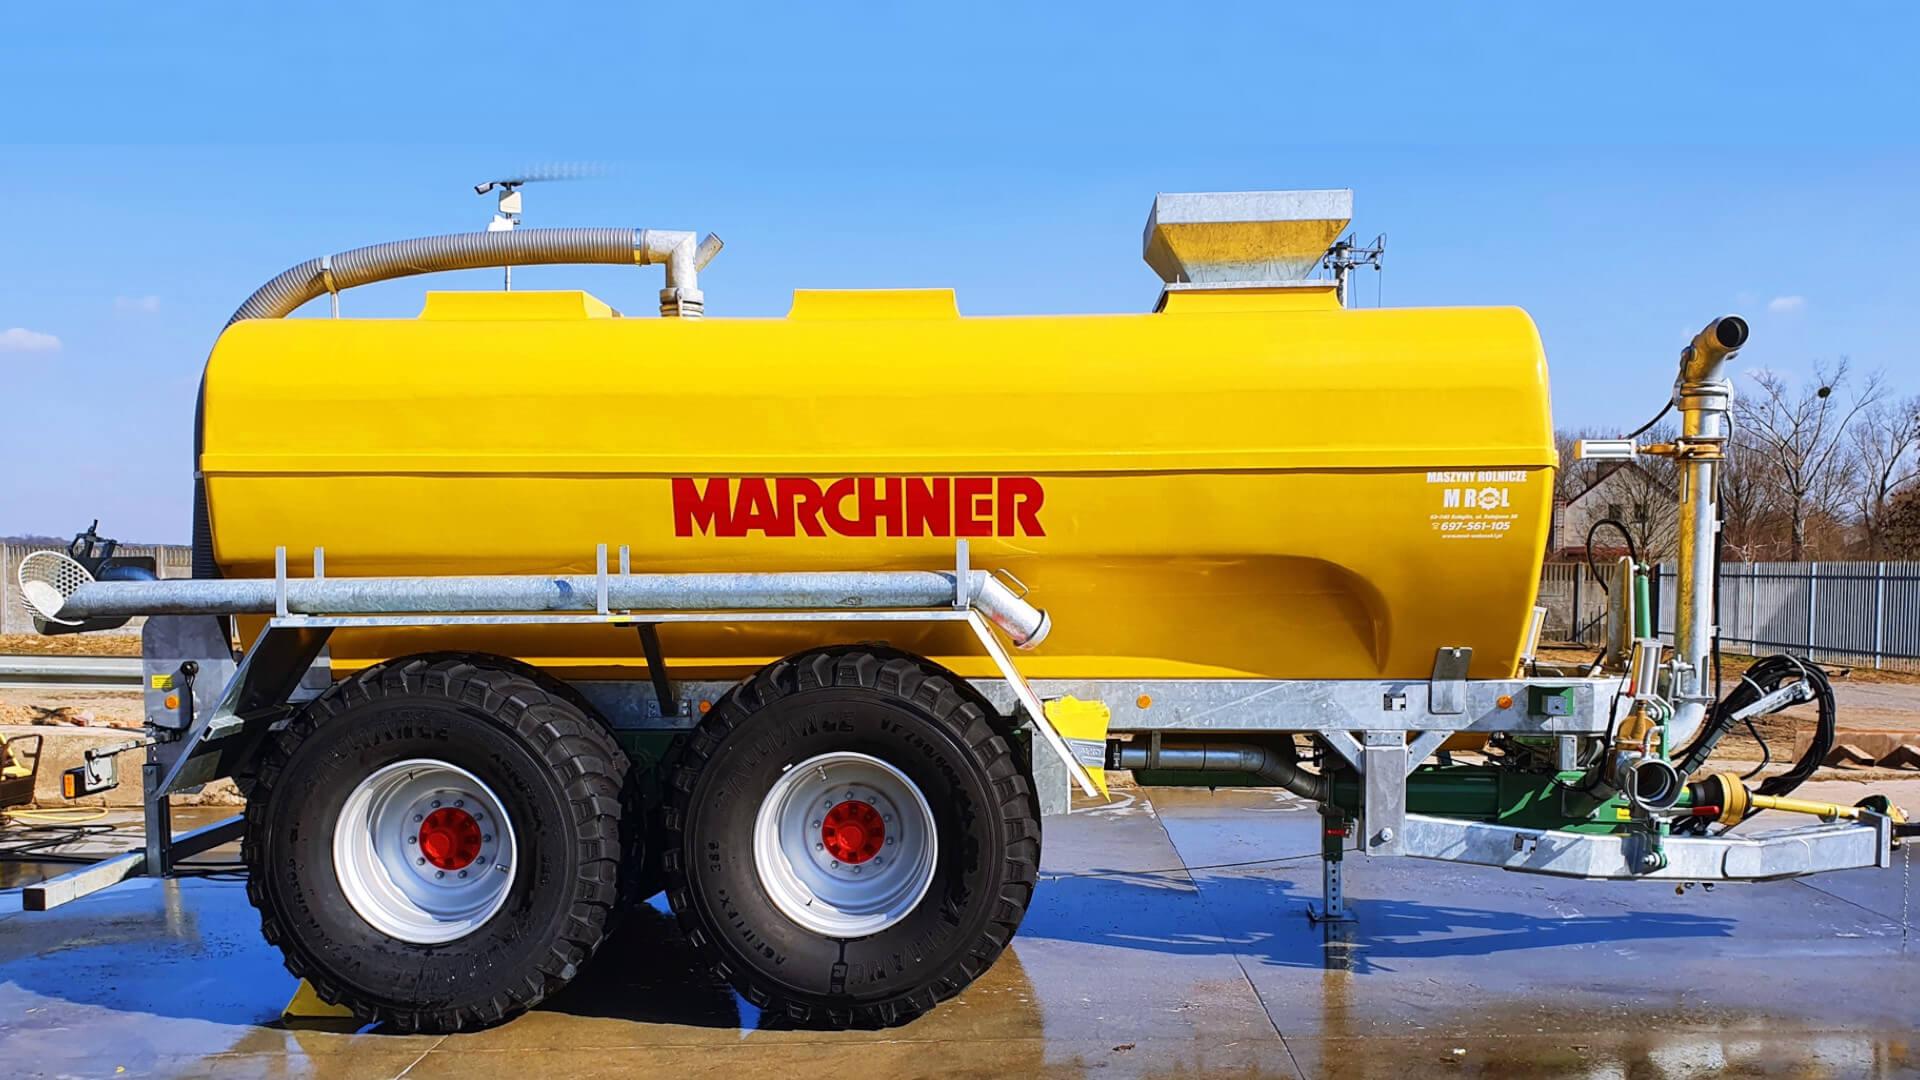 Marchner